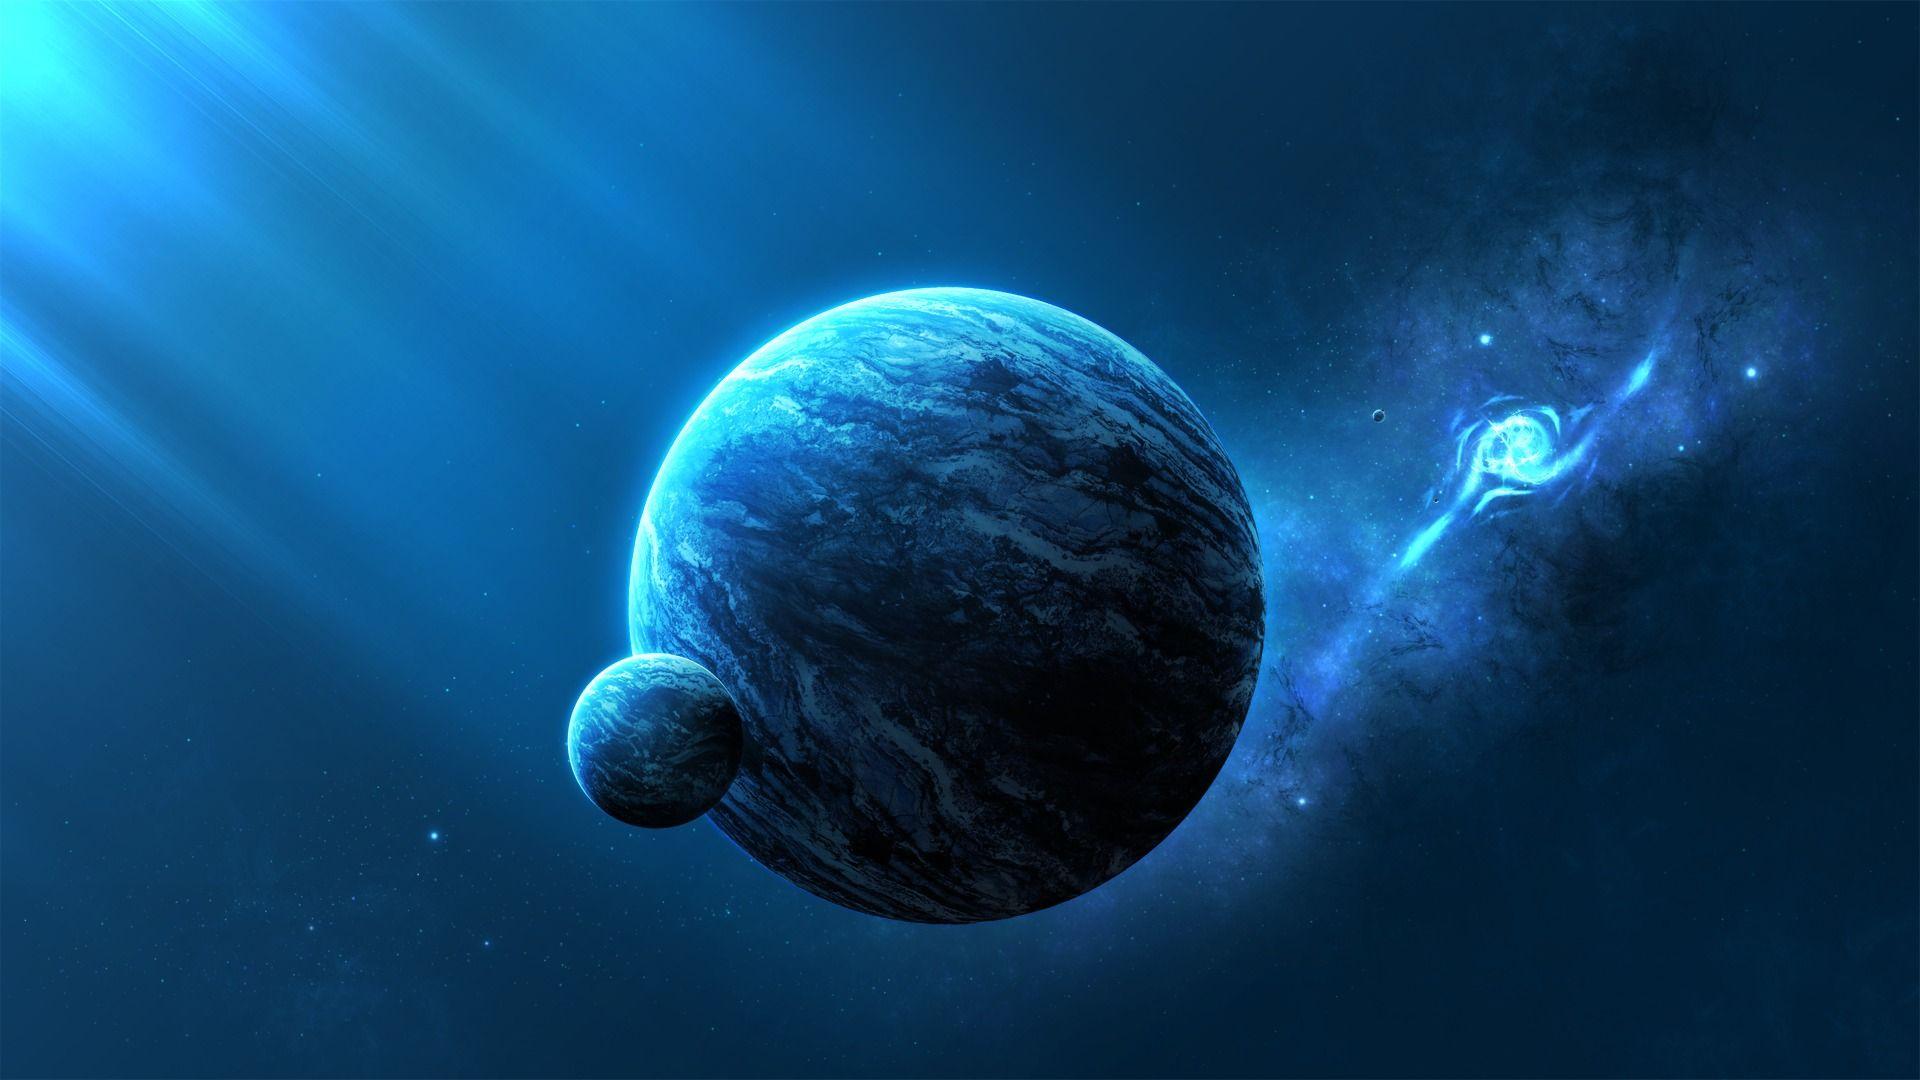 Hd Wallpaper Space Space Moon Nebula Planet 1920x1080 Planets Wallpaper Wallpaper Earth Earth Hd